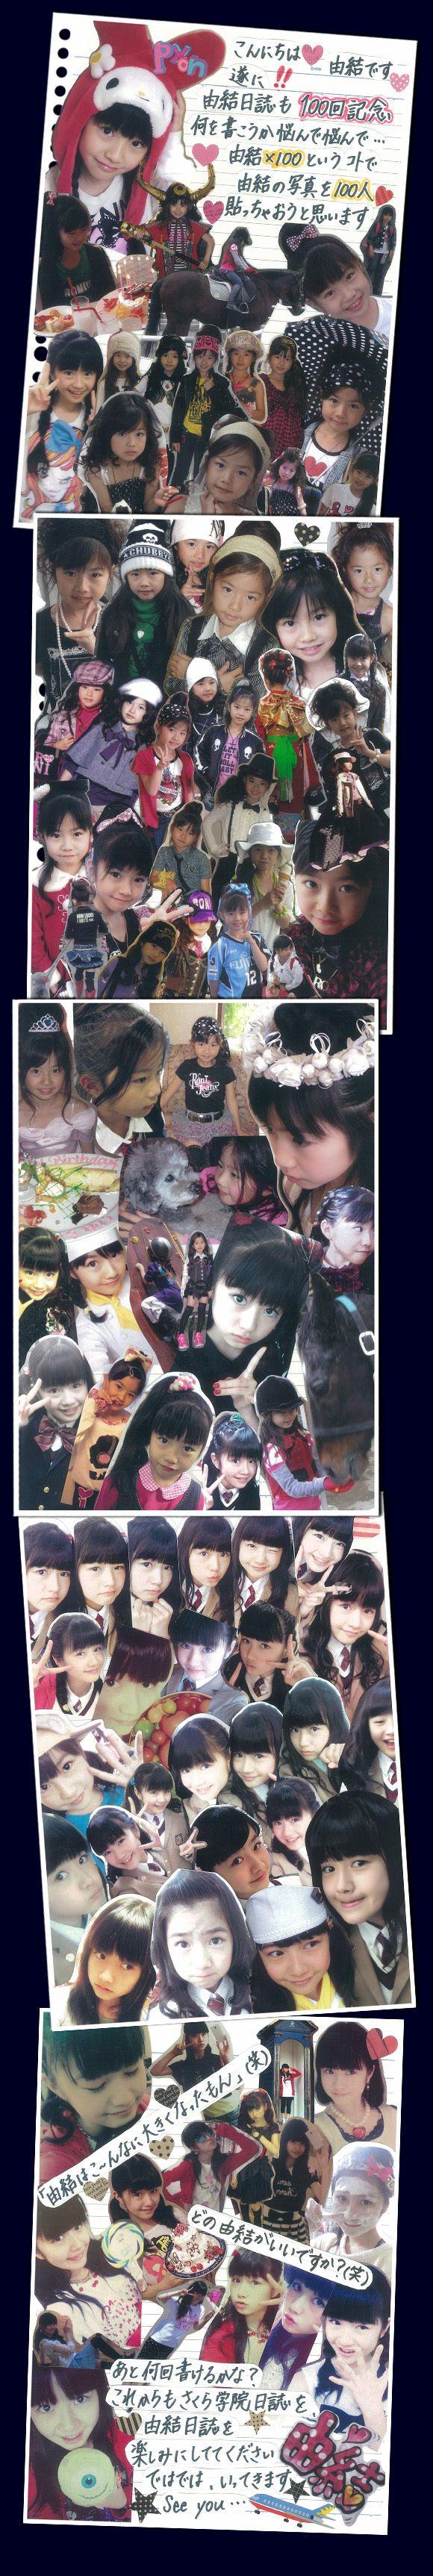 YUI's Diary さくら学院オフィシャルブログ「学院日誌」Powered by Ameba